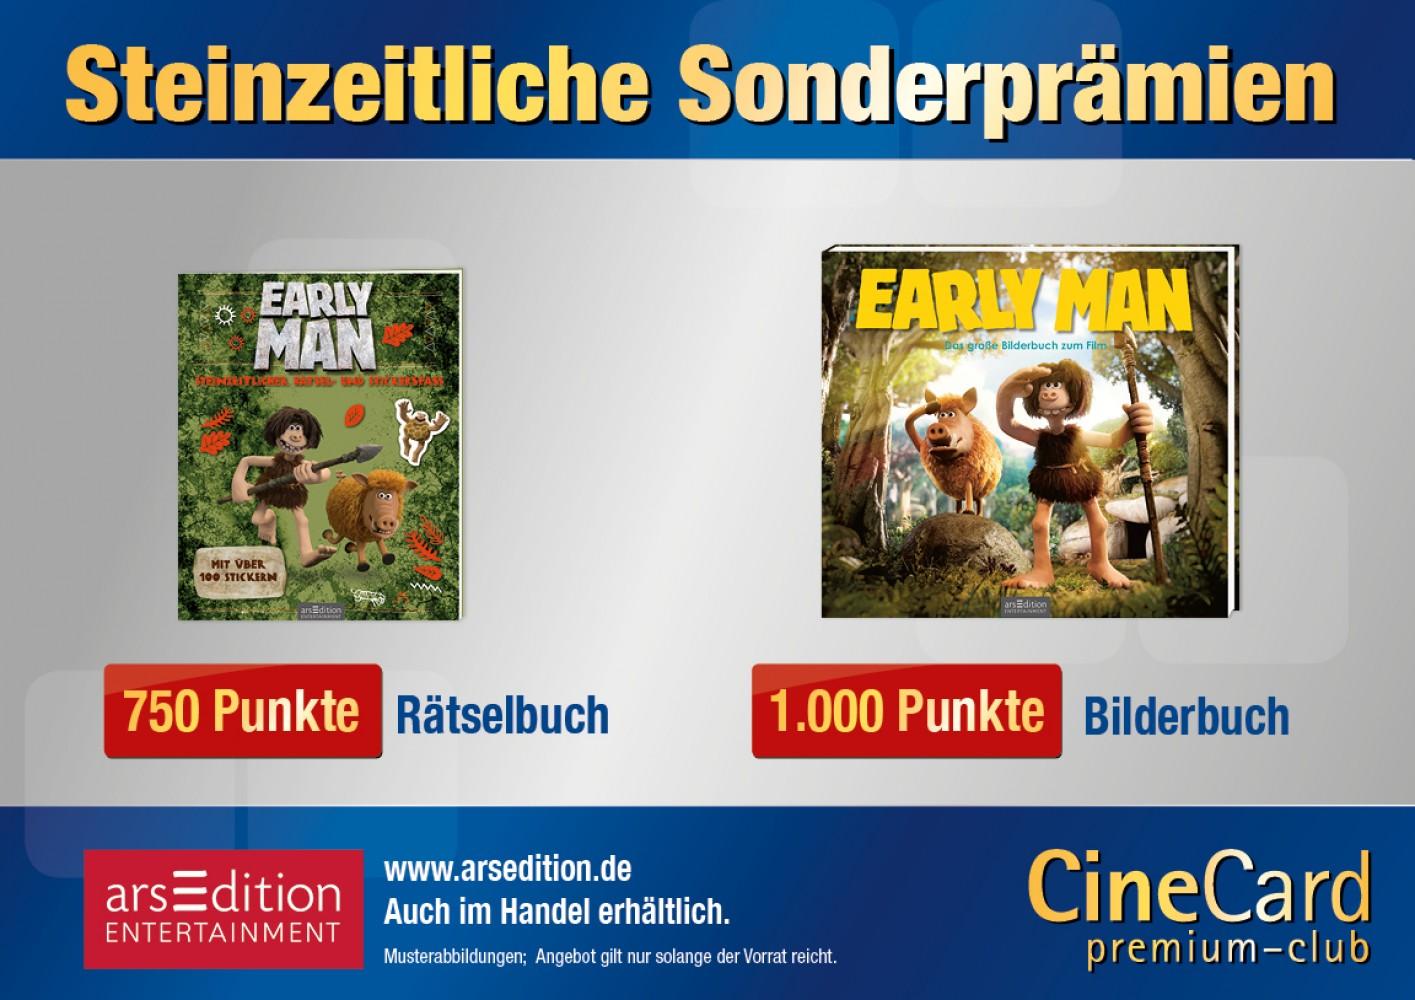 CineCard Bonussystem – Prämien und Privilegien – Universum-City Kinos